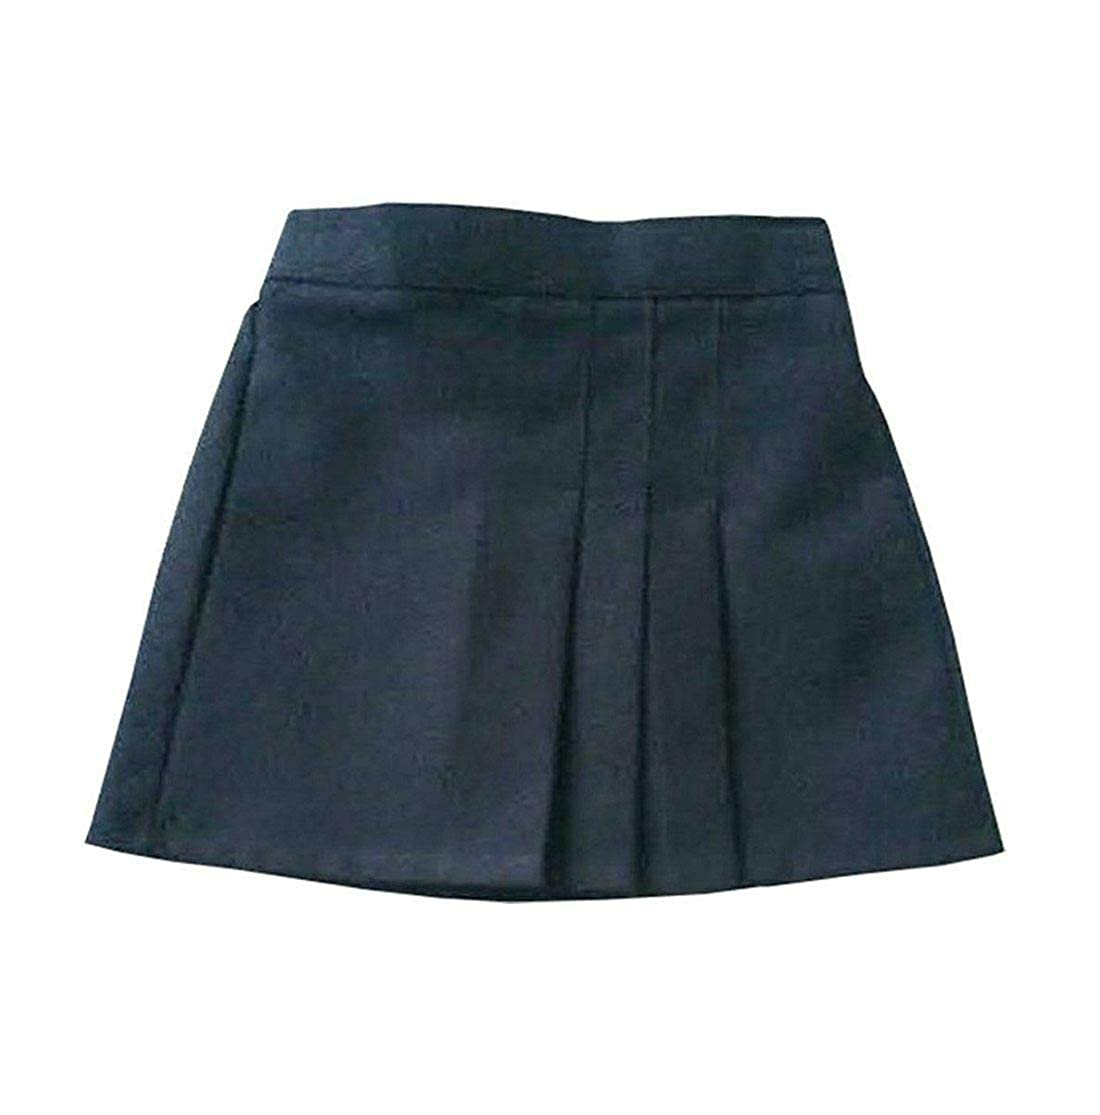 My Choice Stuff Regular School Girls Three Pleated Skirt Kids Elasticated Waist School Uniform Skirt